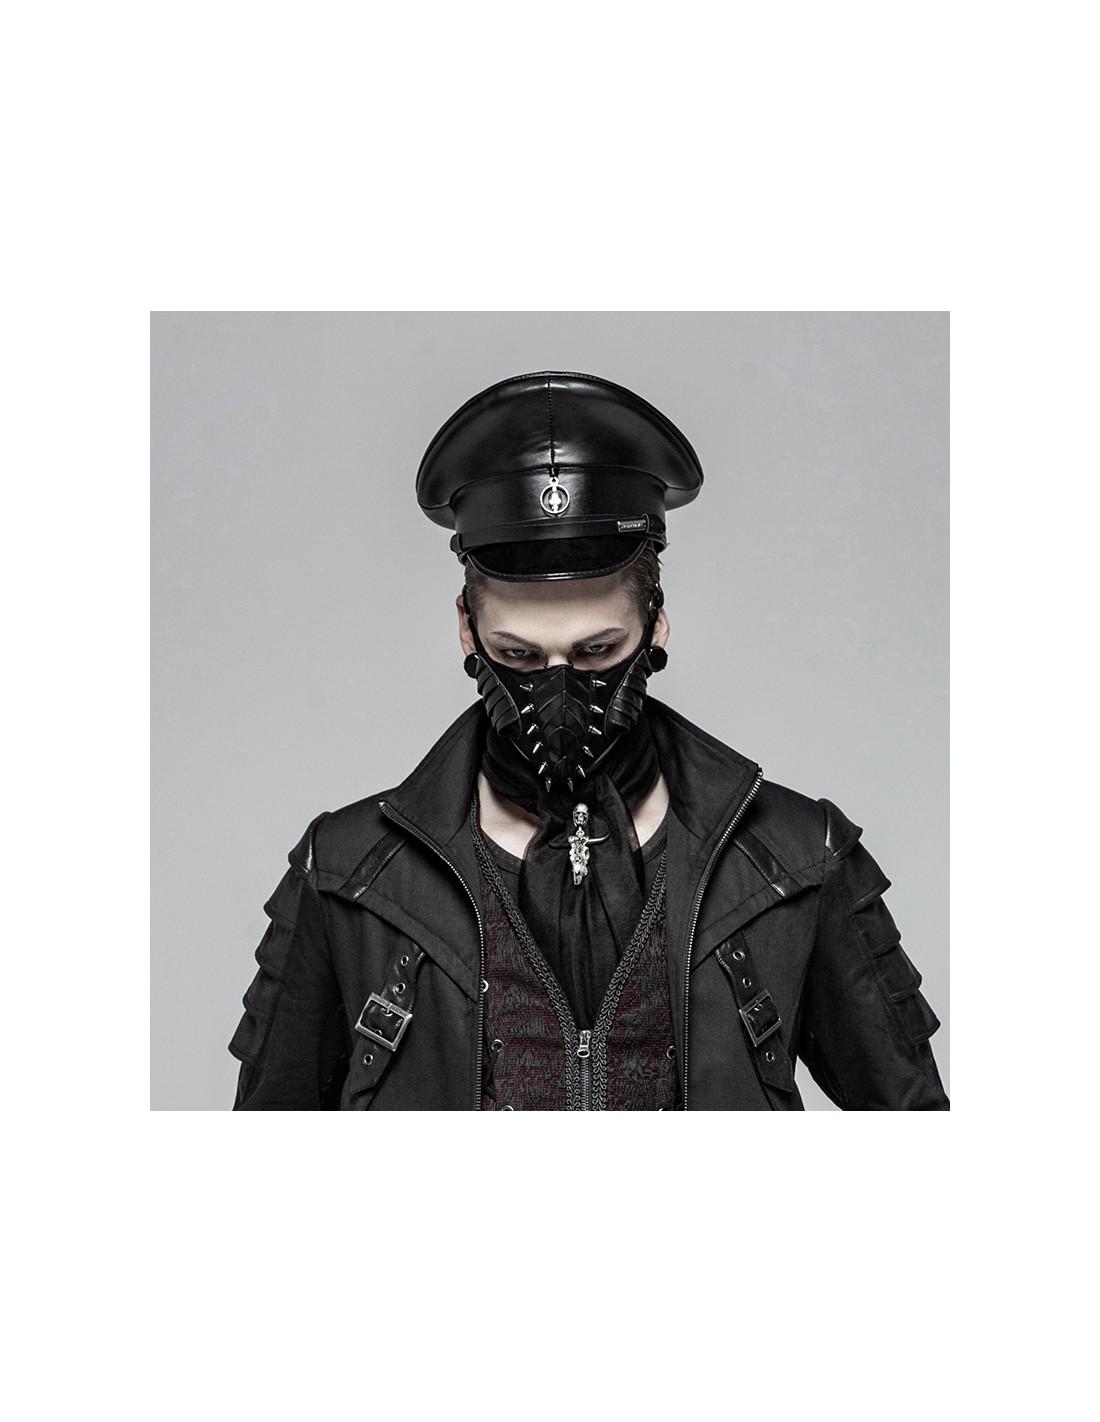 ebeb57094 Sinister Commissar Hat